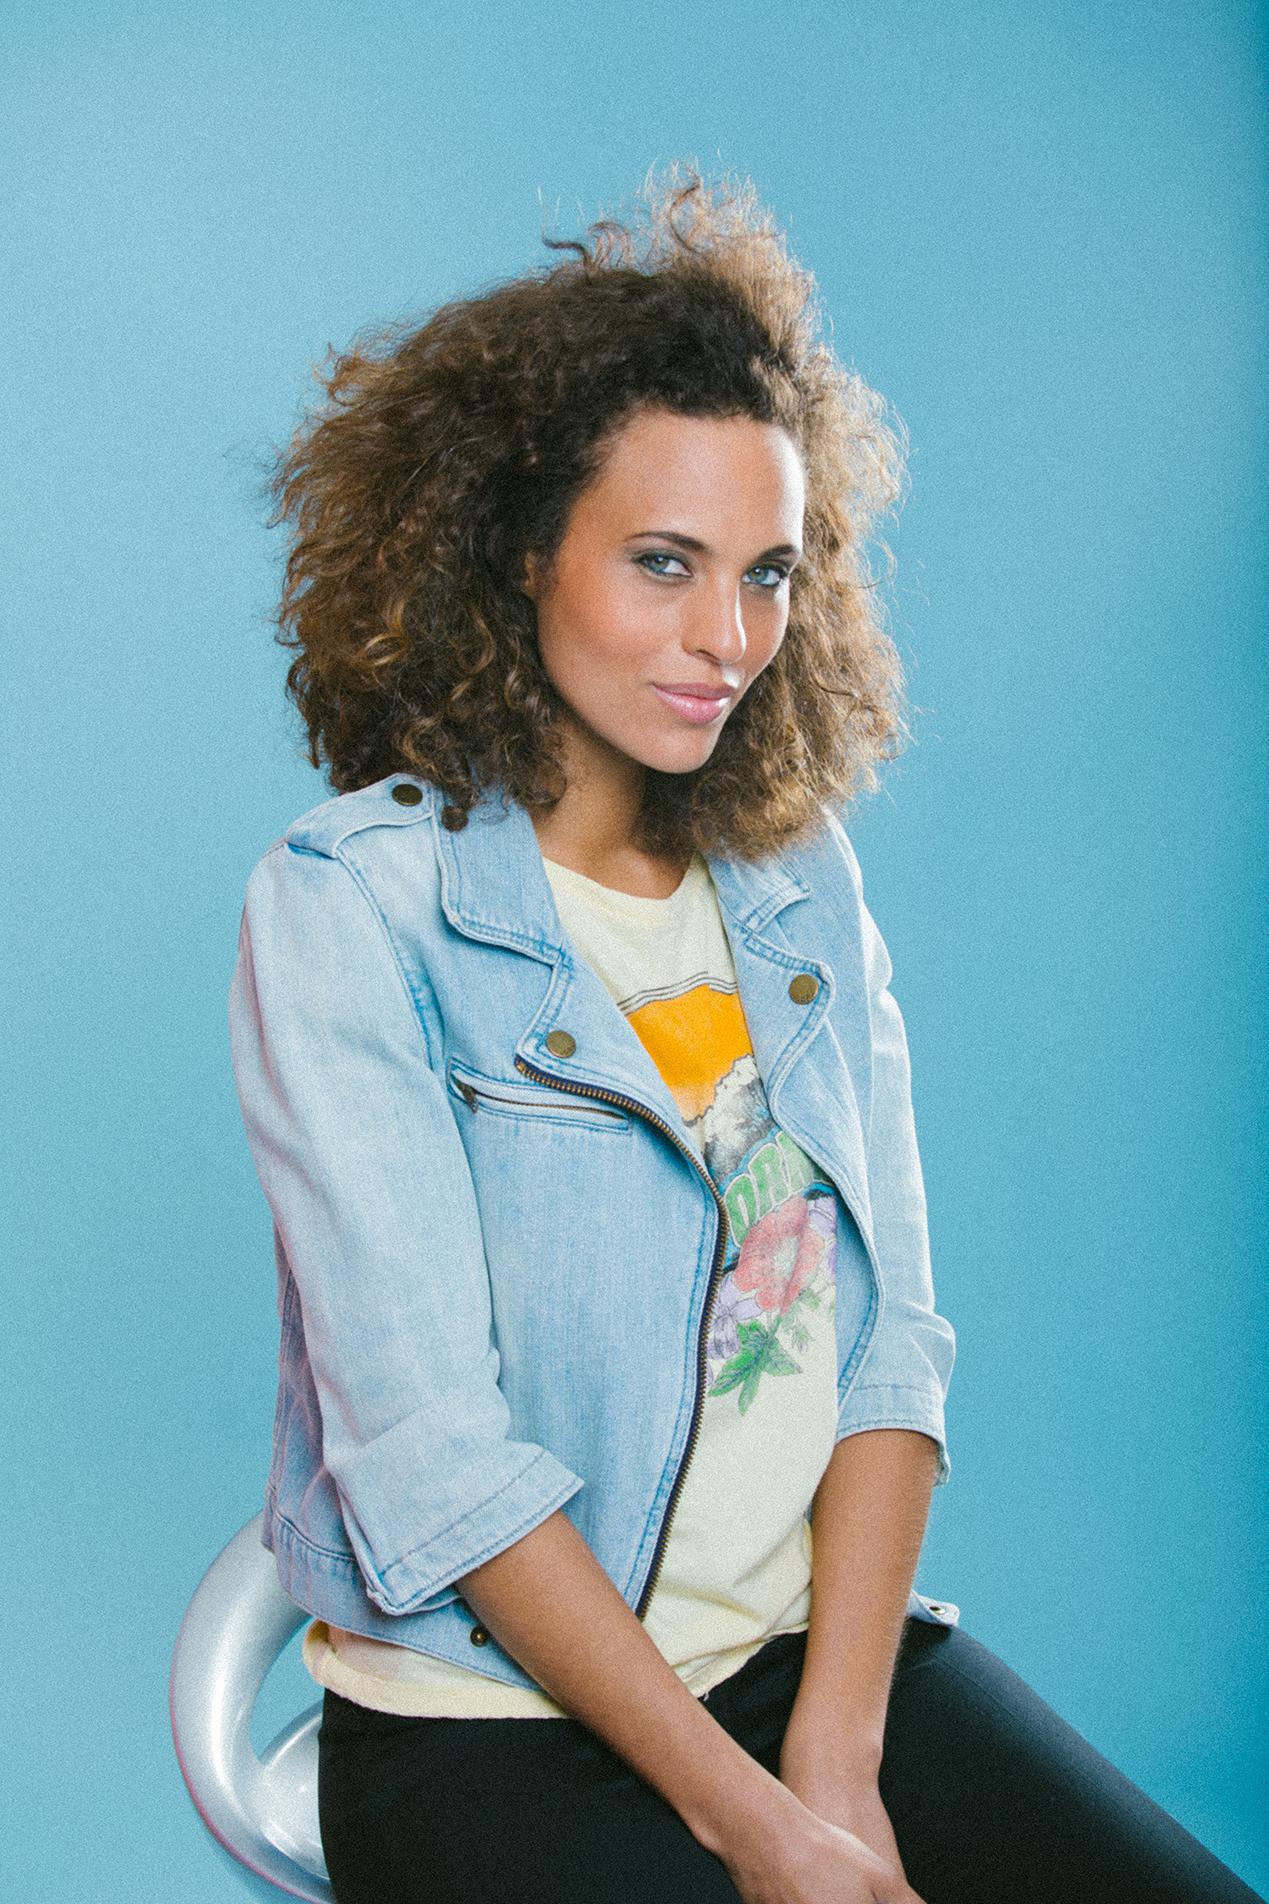 Paula Vip Models by alexis jacquin-1039_web.jpg